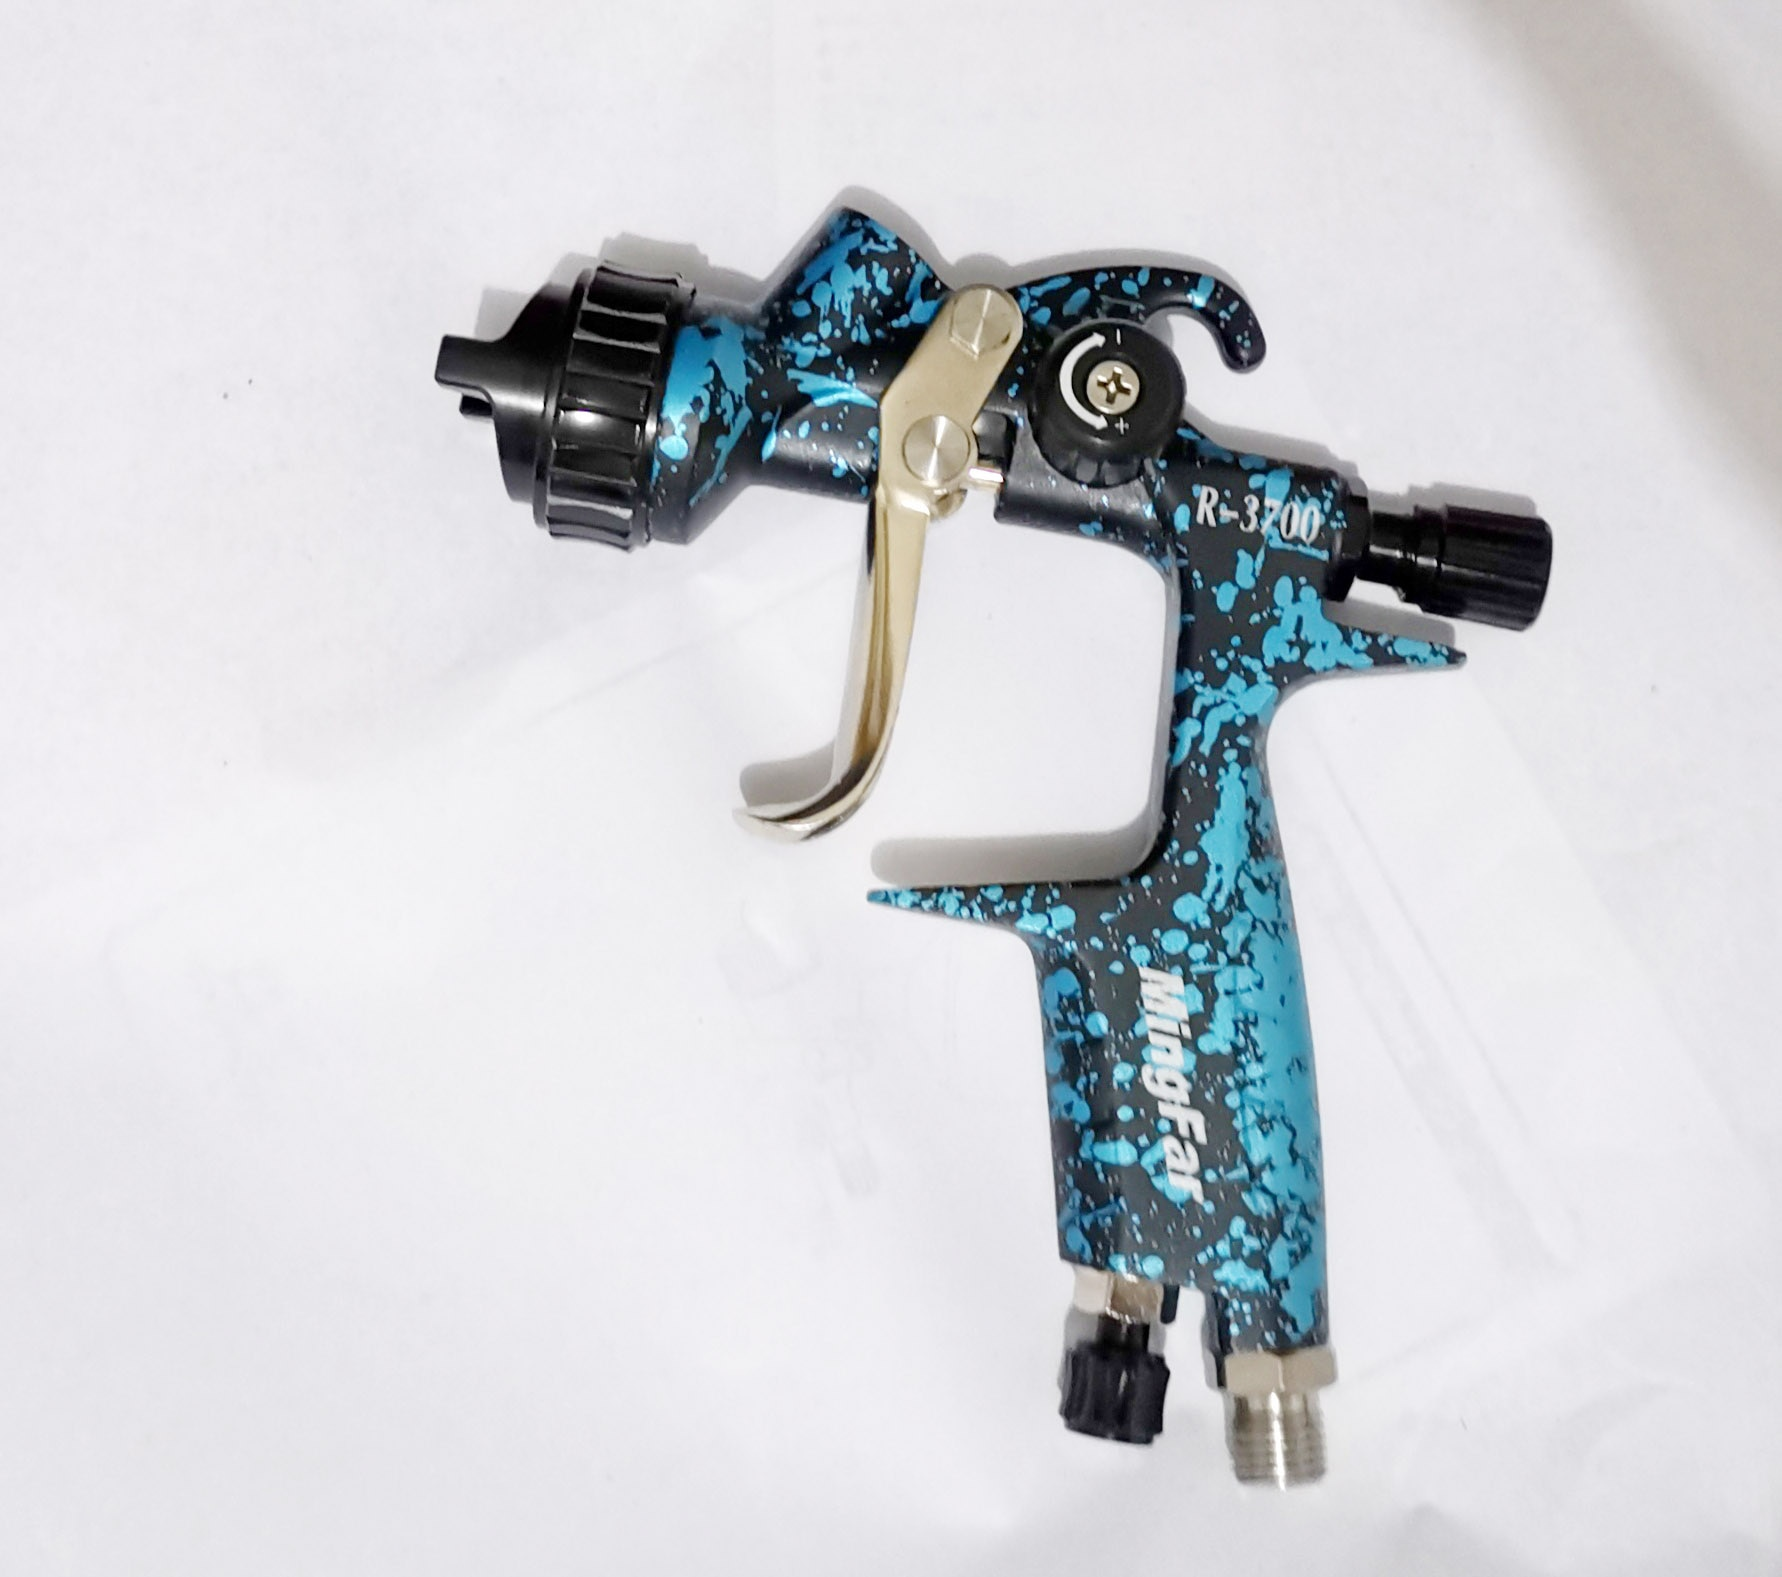 Profissional pistola de pintura a ar pulverizador hvlp dicas alimentação por gravidade 1.3/1.4 bico w/t 600 tanque ferramenta pintura do corpo carro pistola pistola